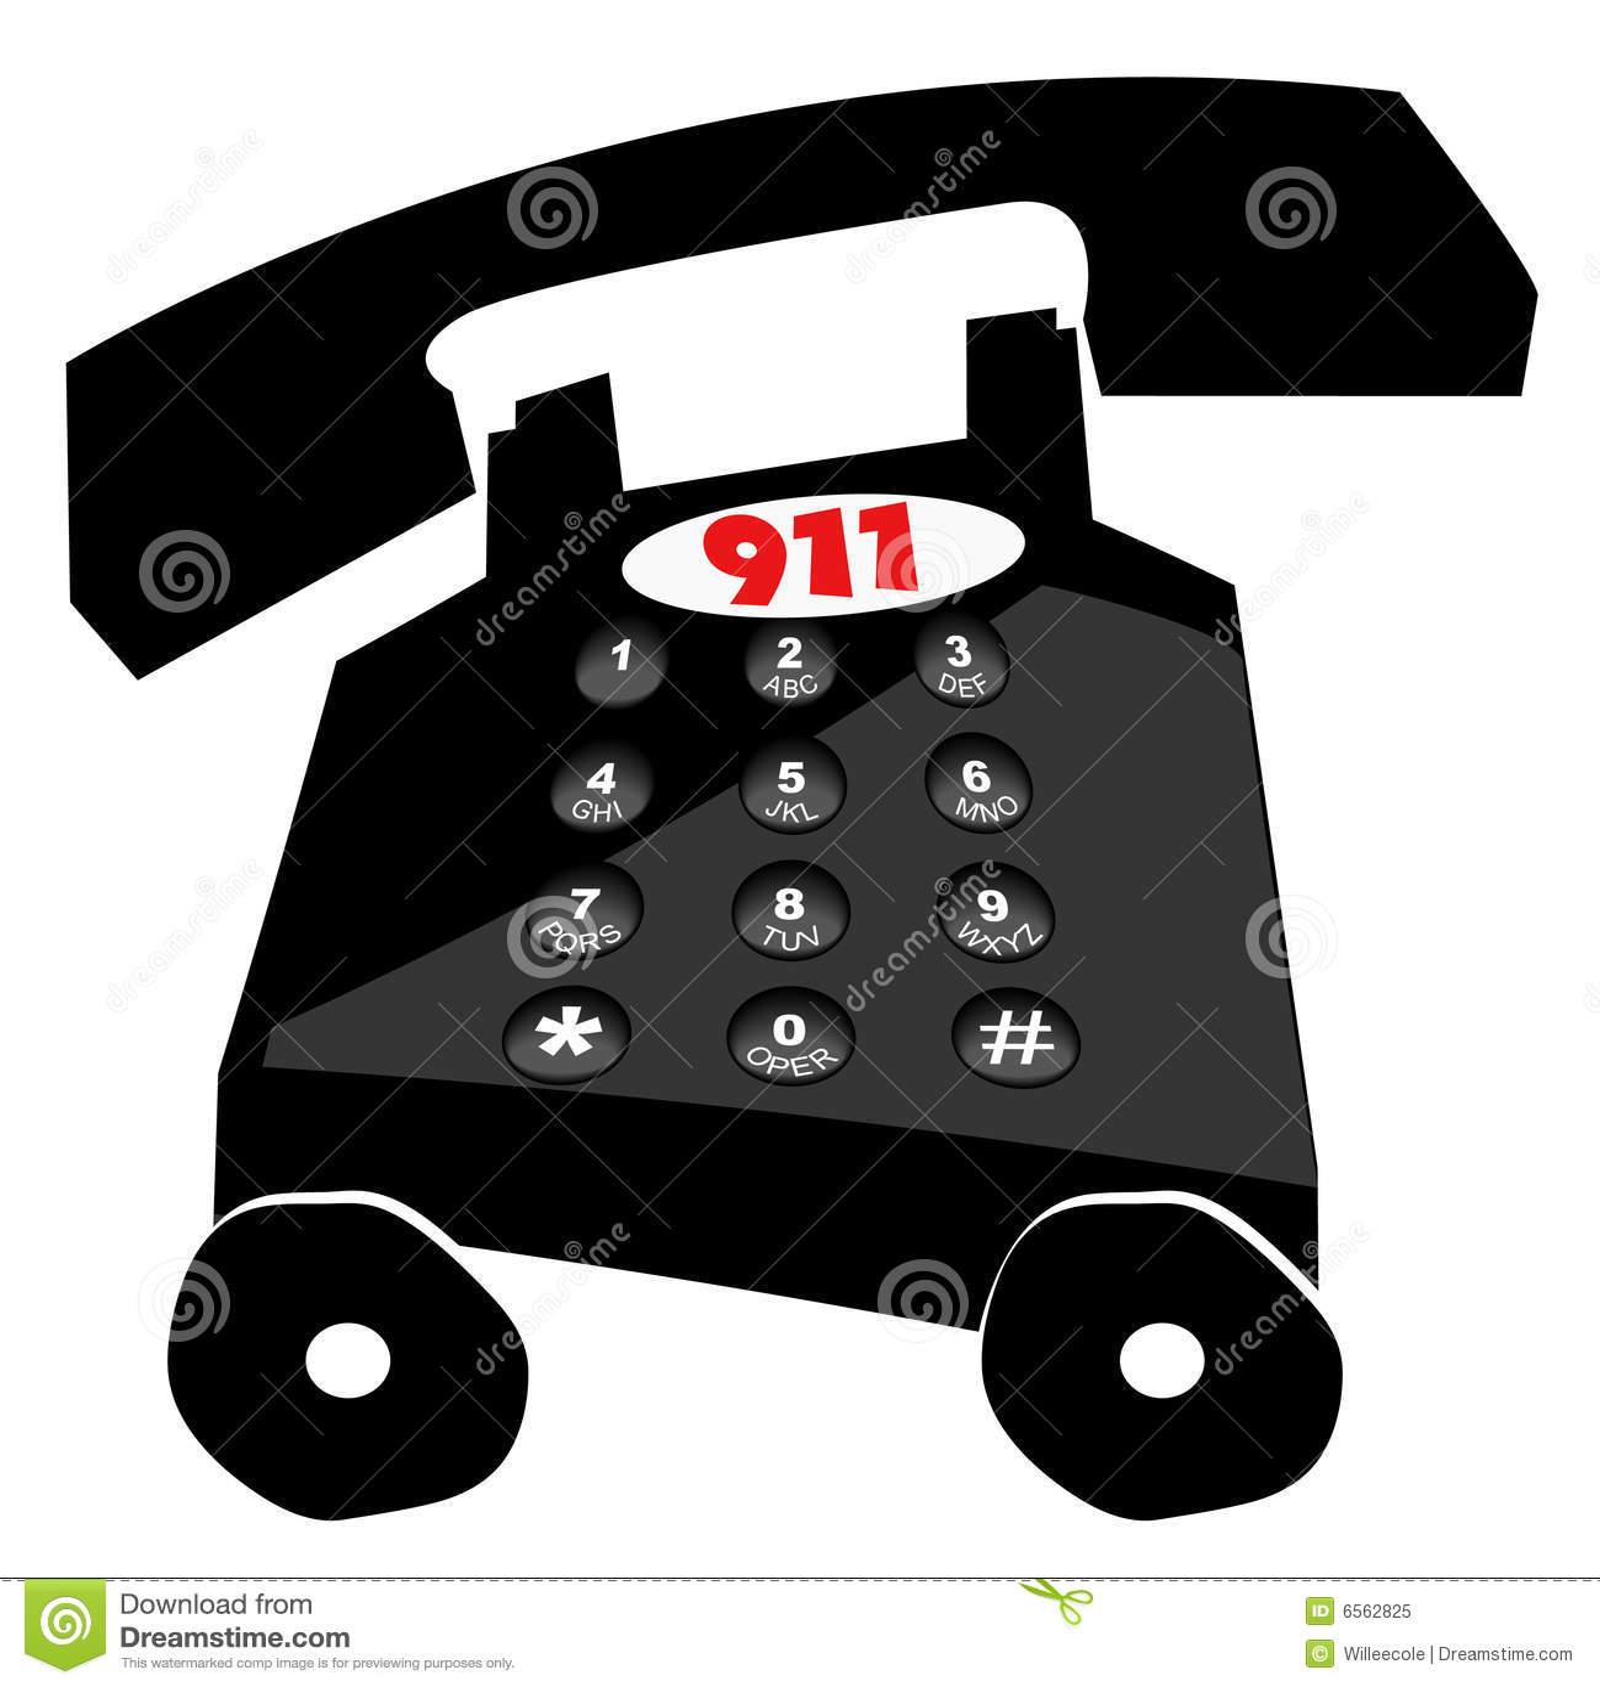 Emergency 911 Stock Vector Illustration Of Keys